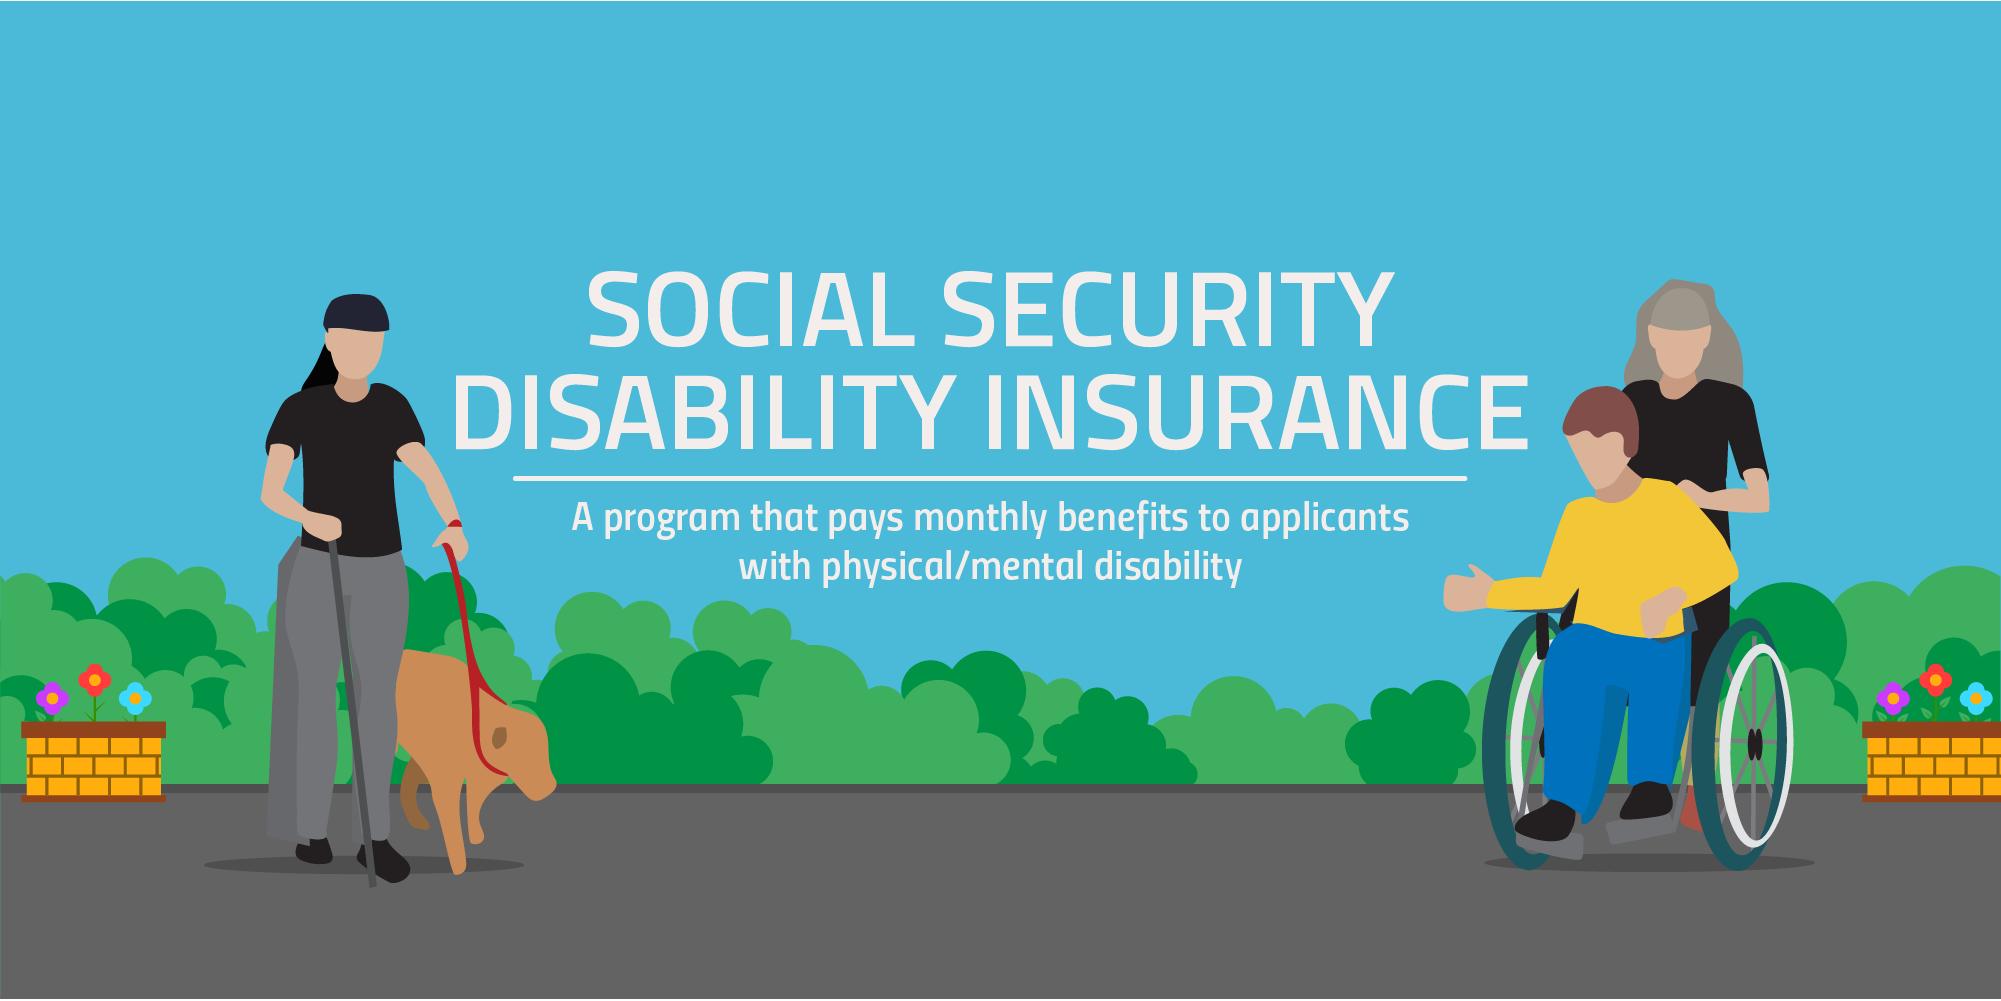 Social Security Disability Insurance SSDI Kindly